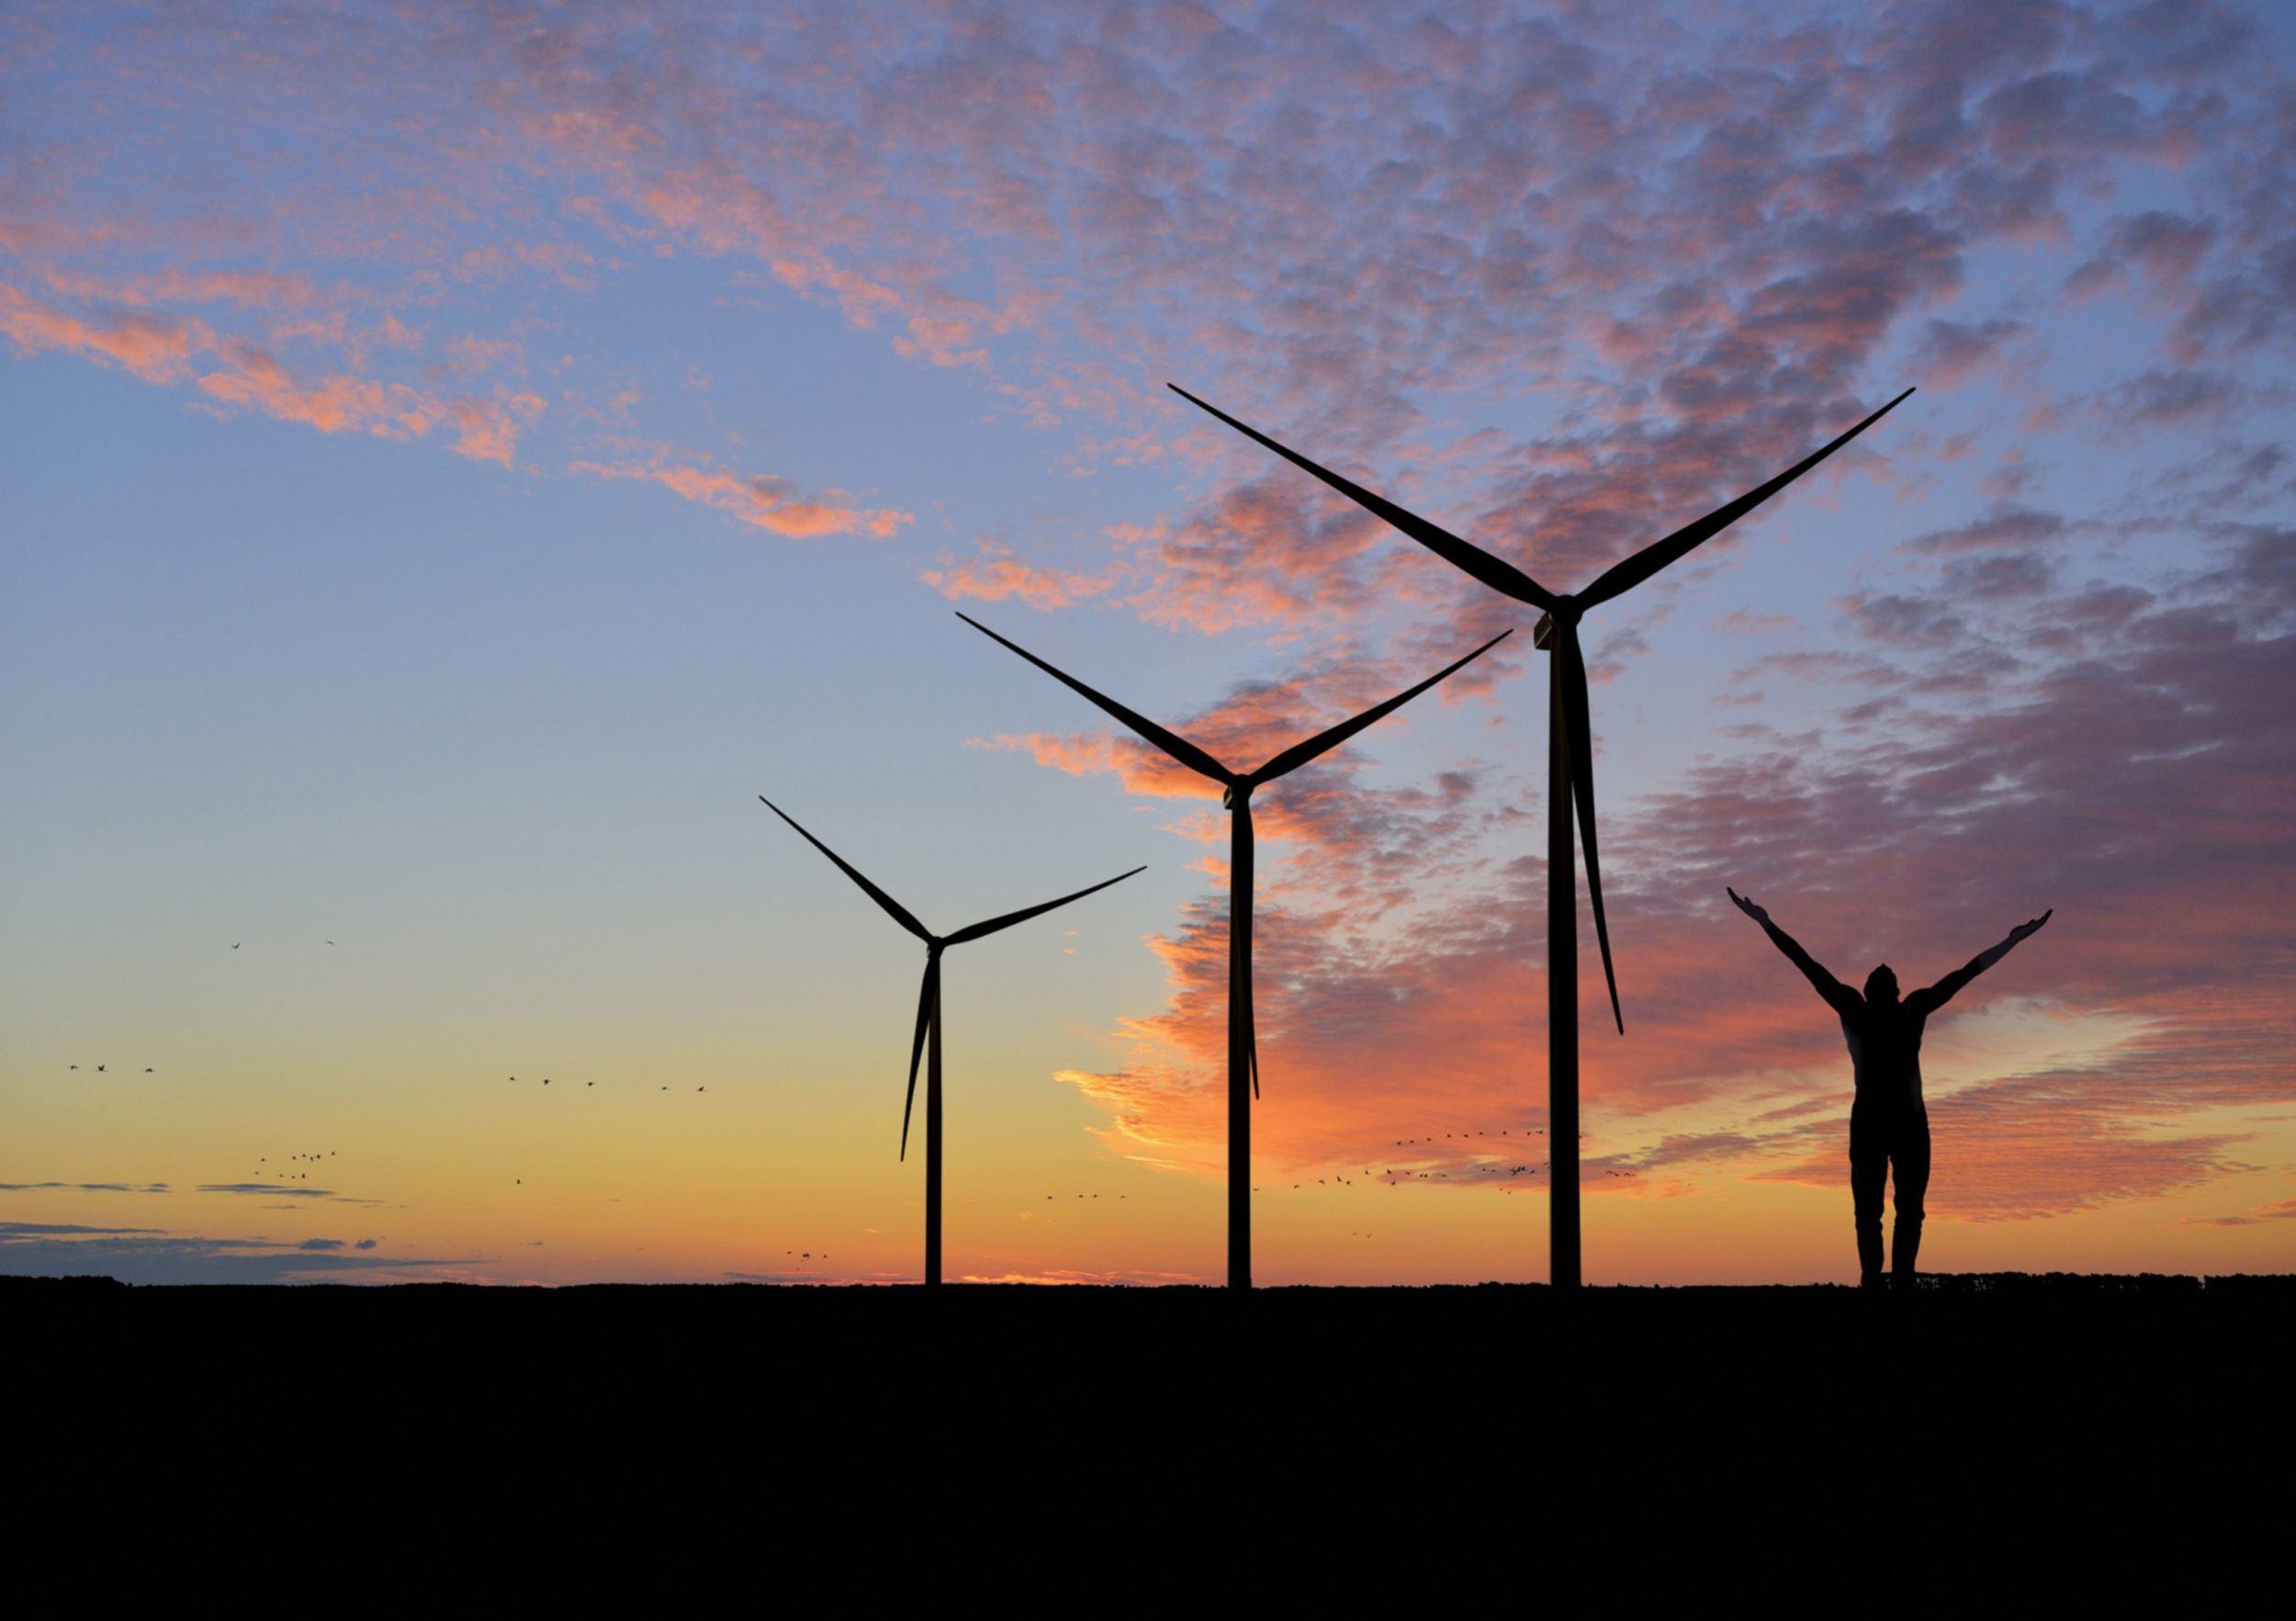 Wind farm with wind turbines